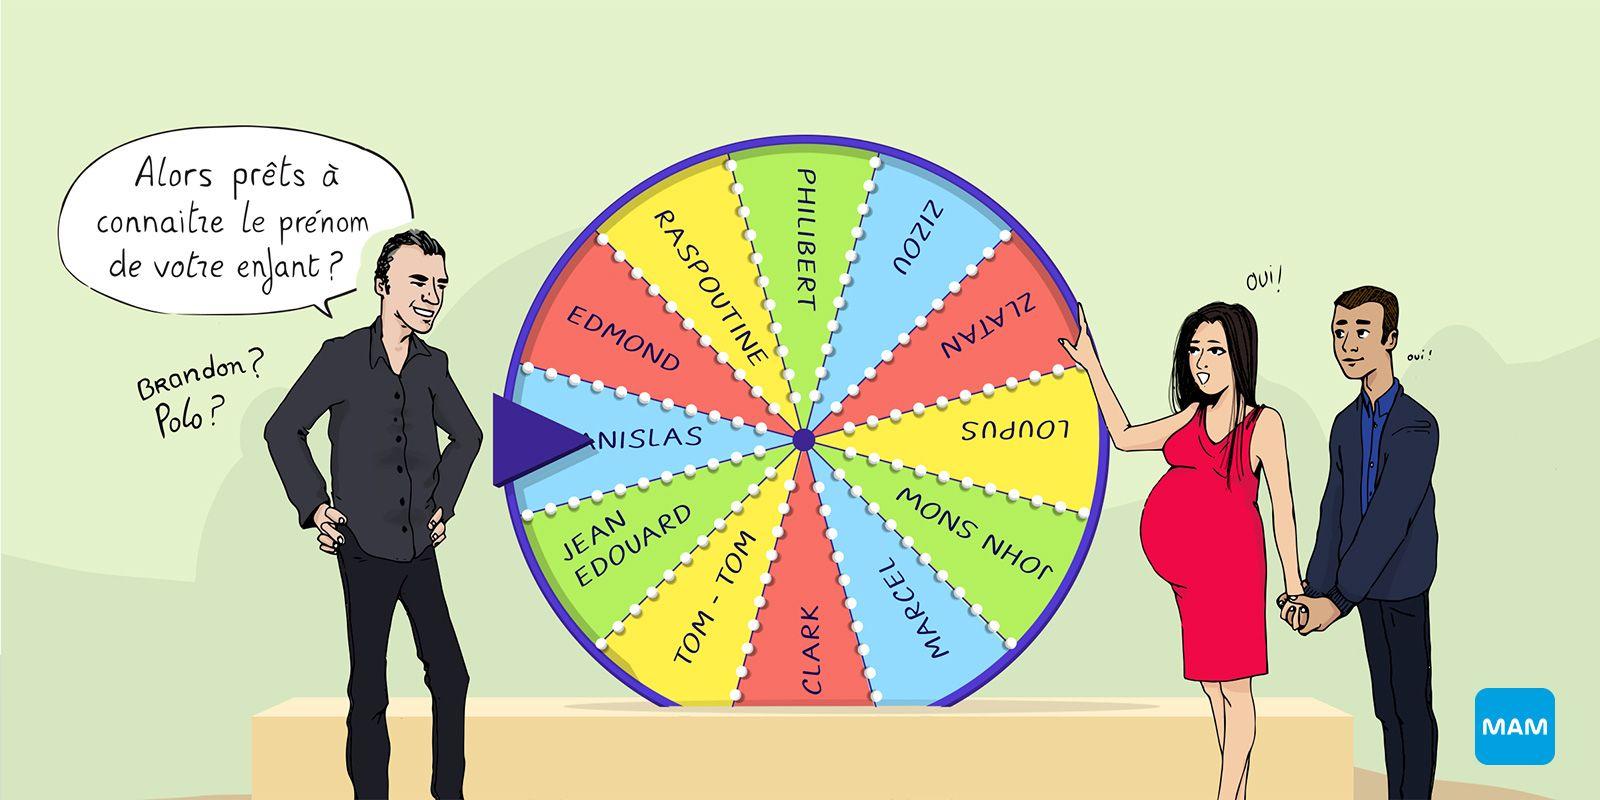 Choix du prénom de bébé - 2eme trimestre de grossesse - Bonjour Grossesse